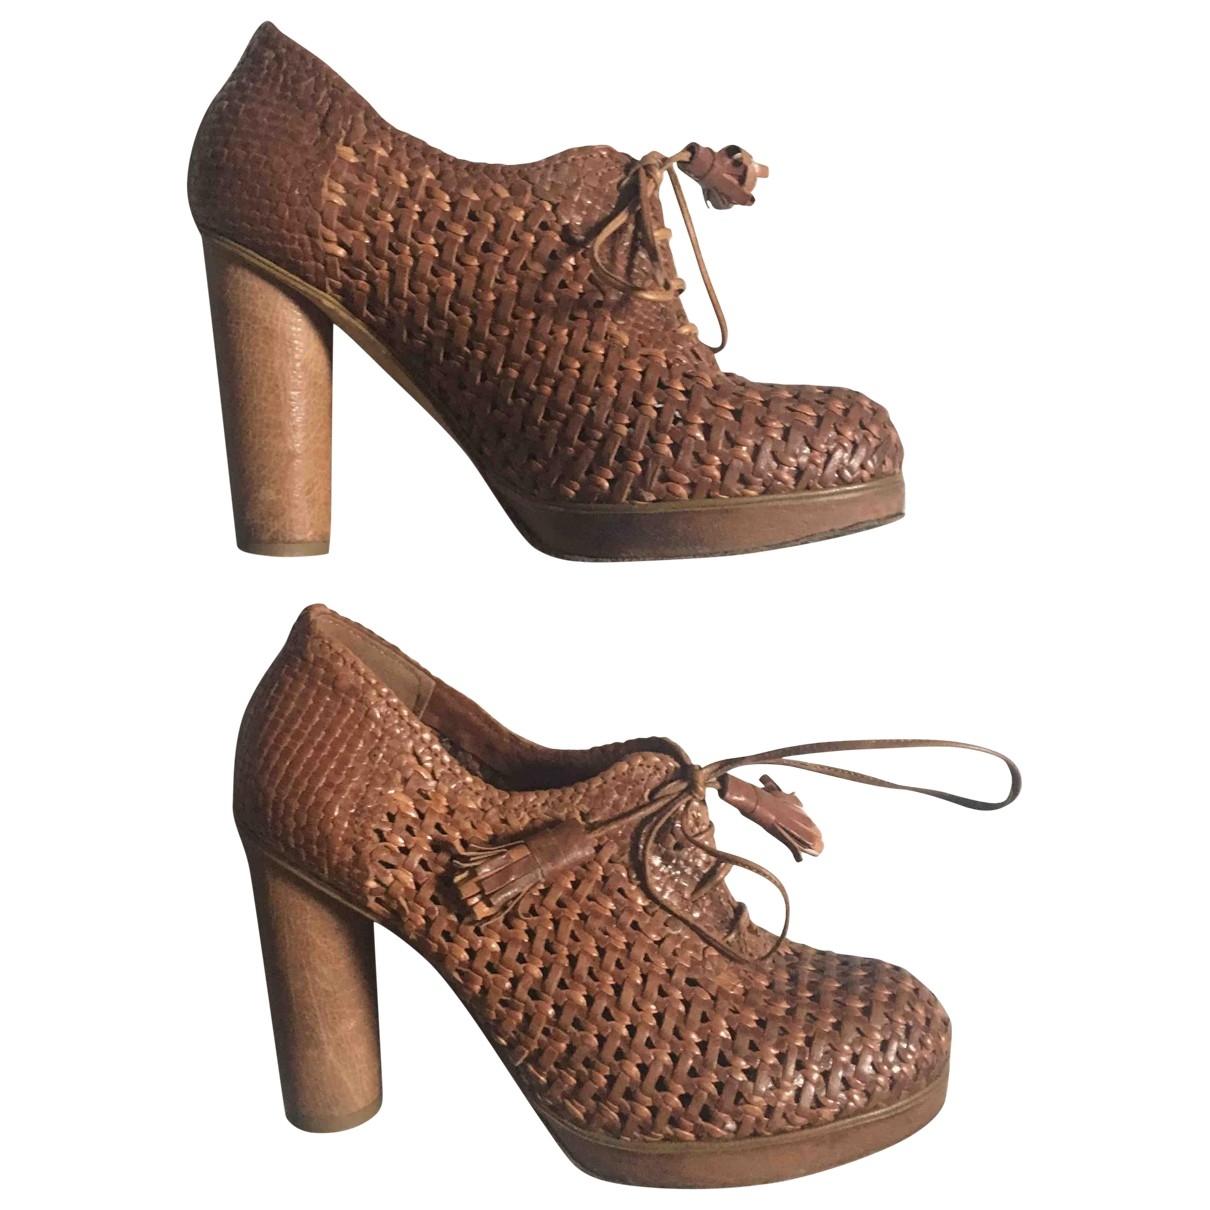 Nicole Farhi \N Brown Leather Heels for Women 37 EU